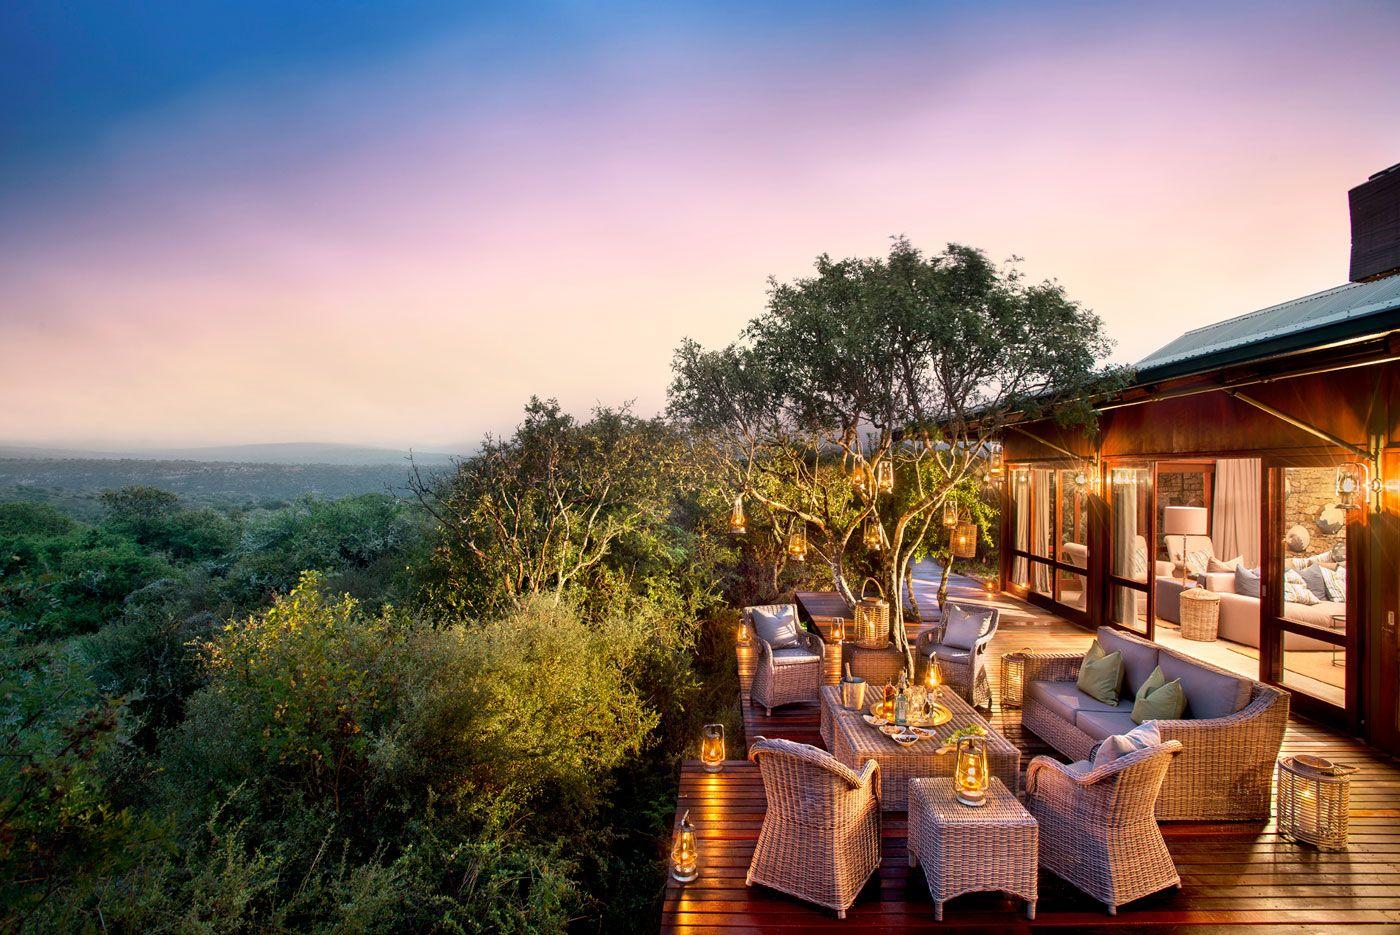 Kwandwe Ecca Lodge Is The Winner Of The 2018 Safari Awards